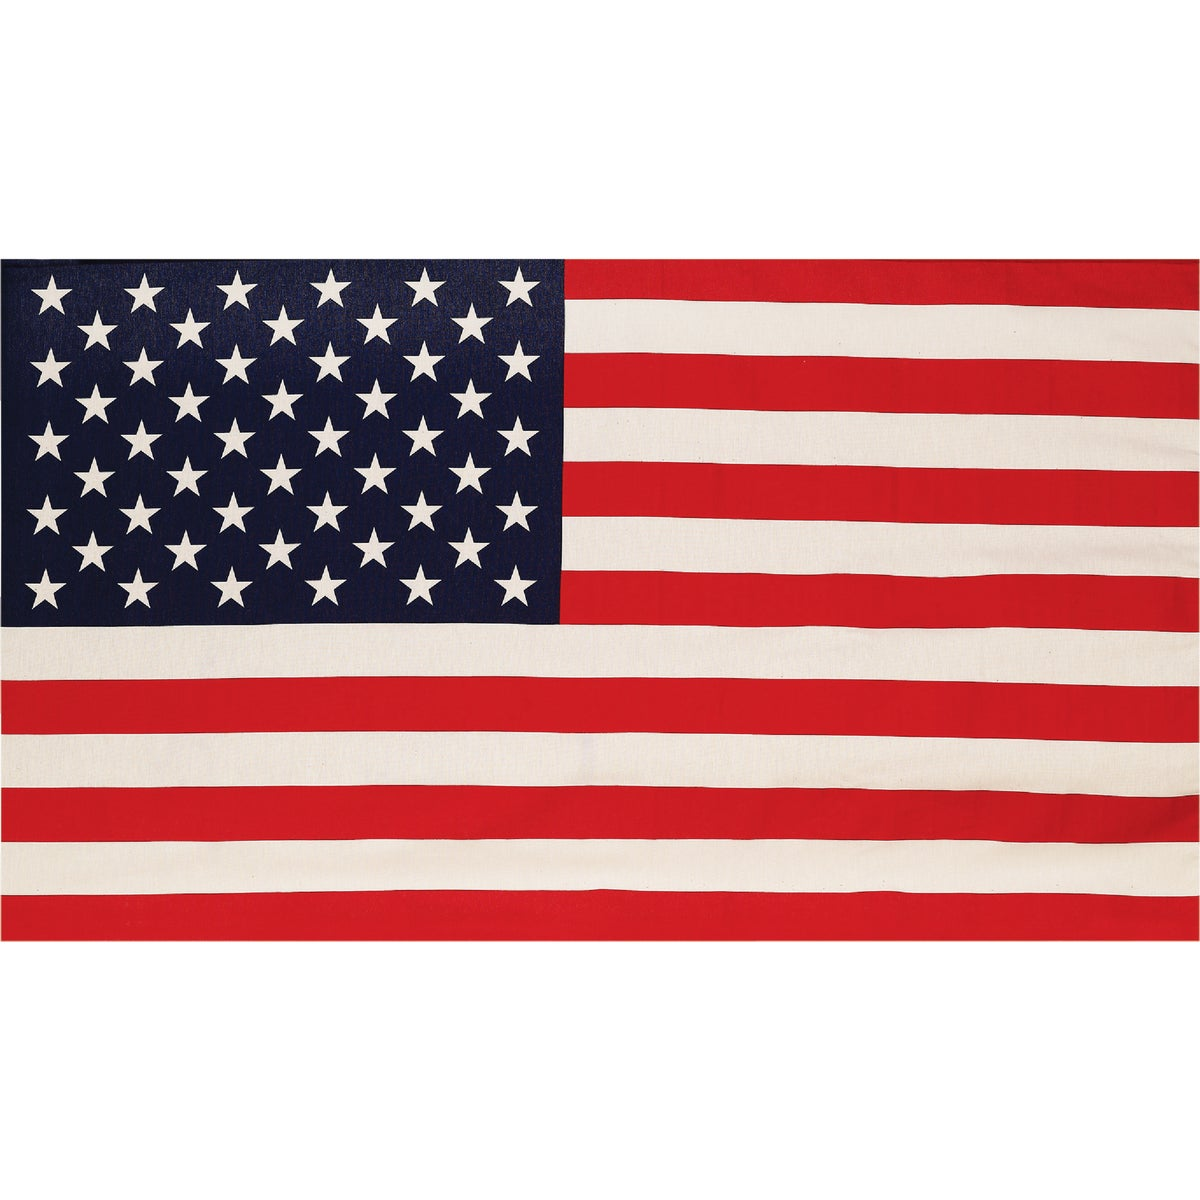 29X50 POLY BANNER FLAG